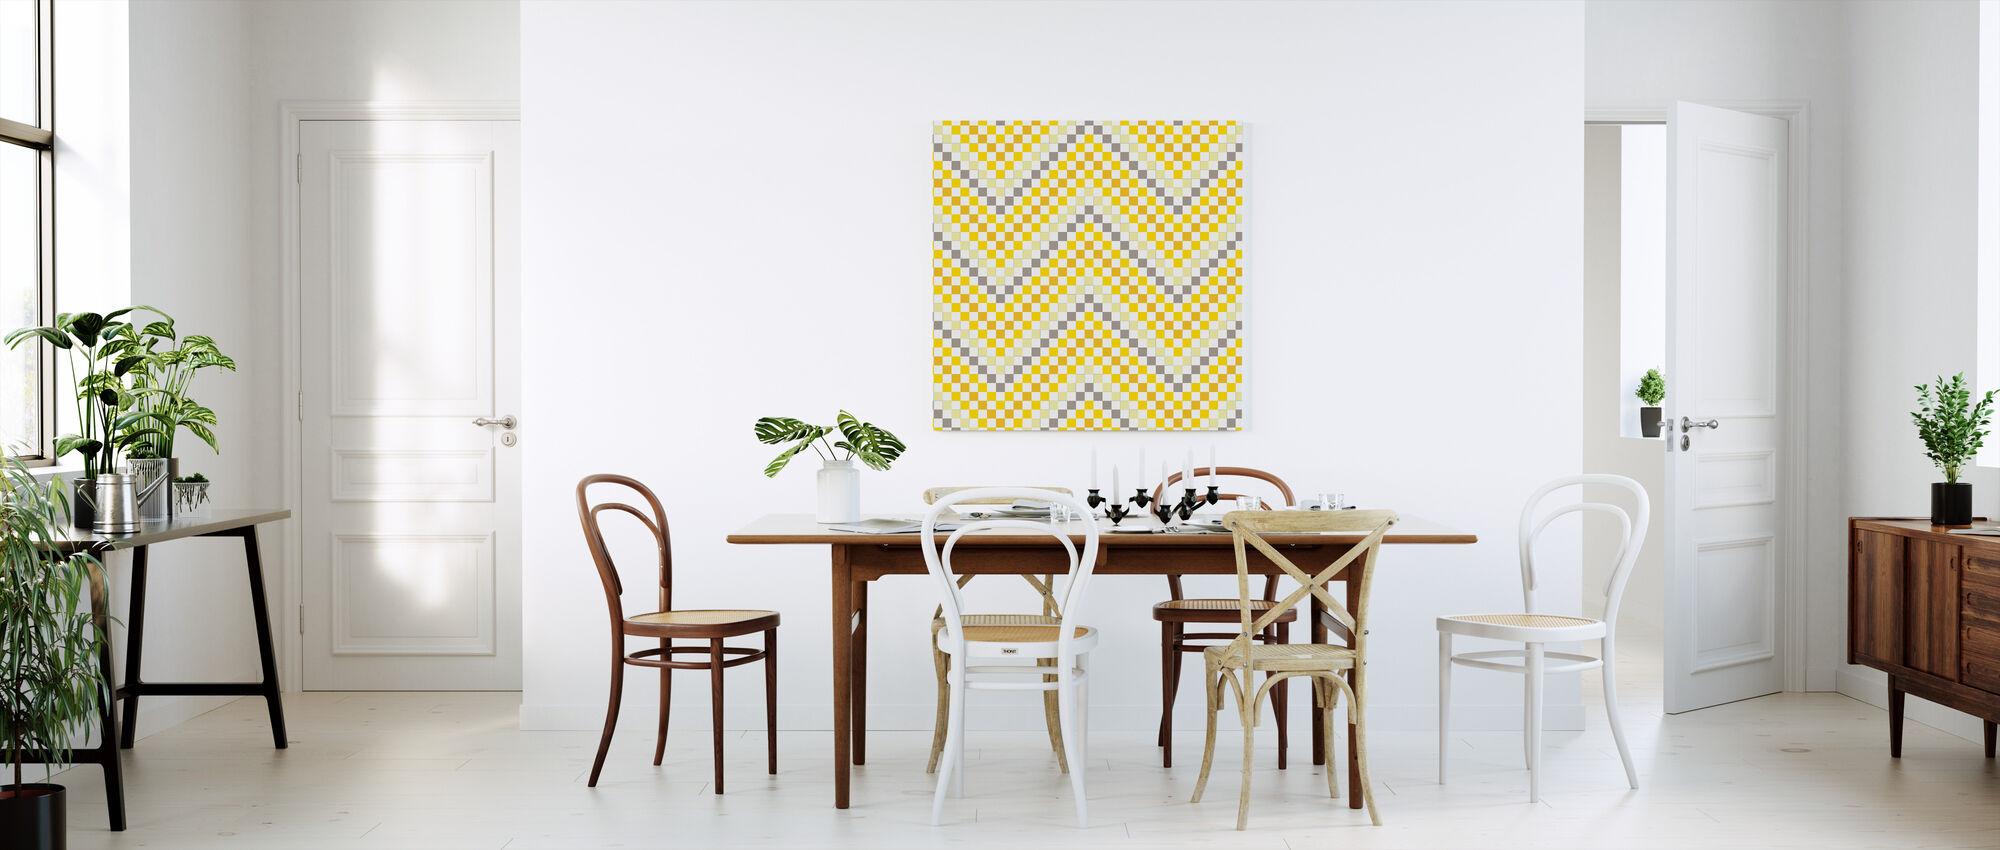 Going Geometric 4 - Canvas print - Kitchen